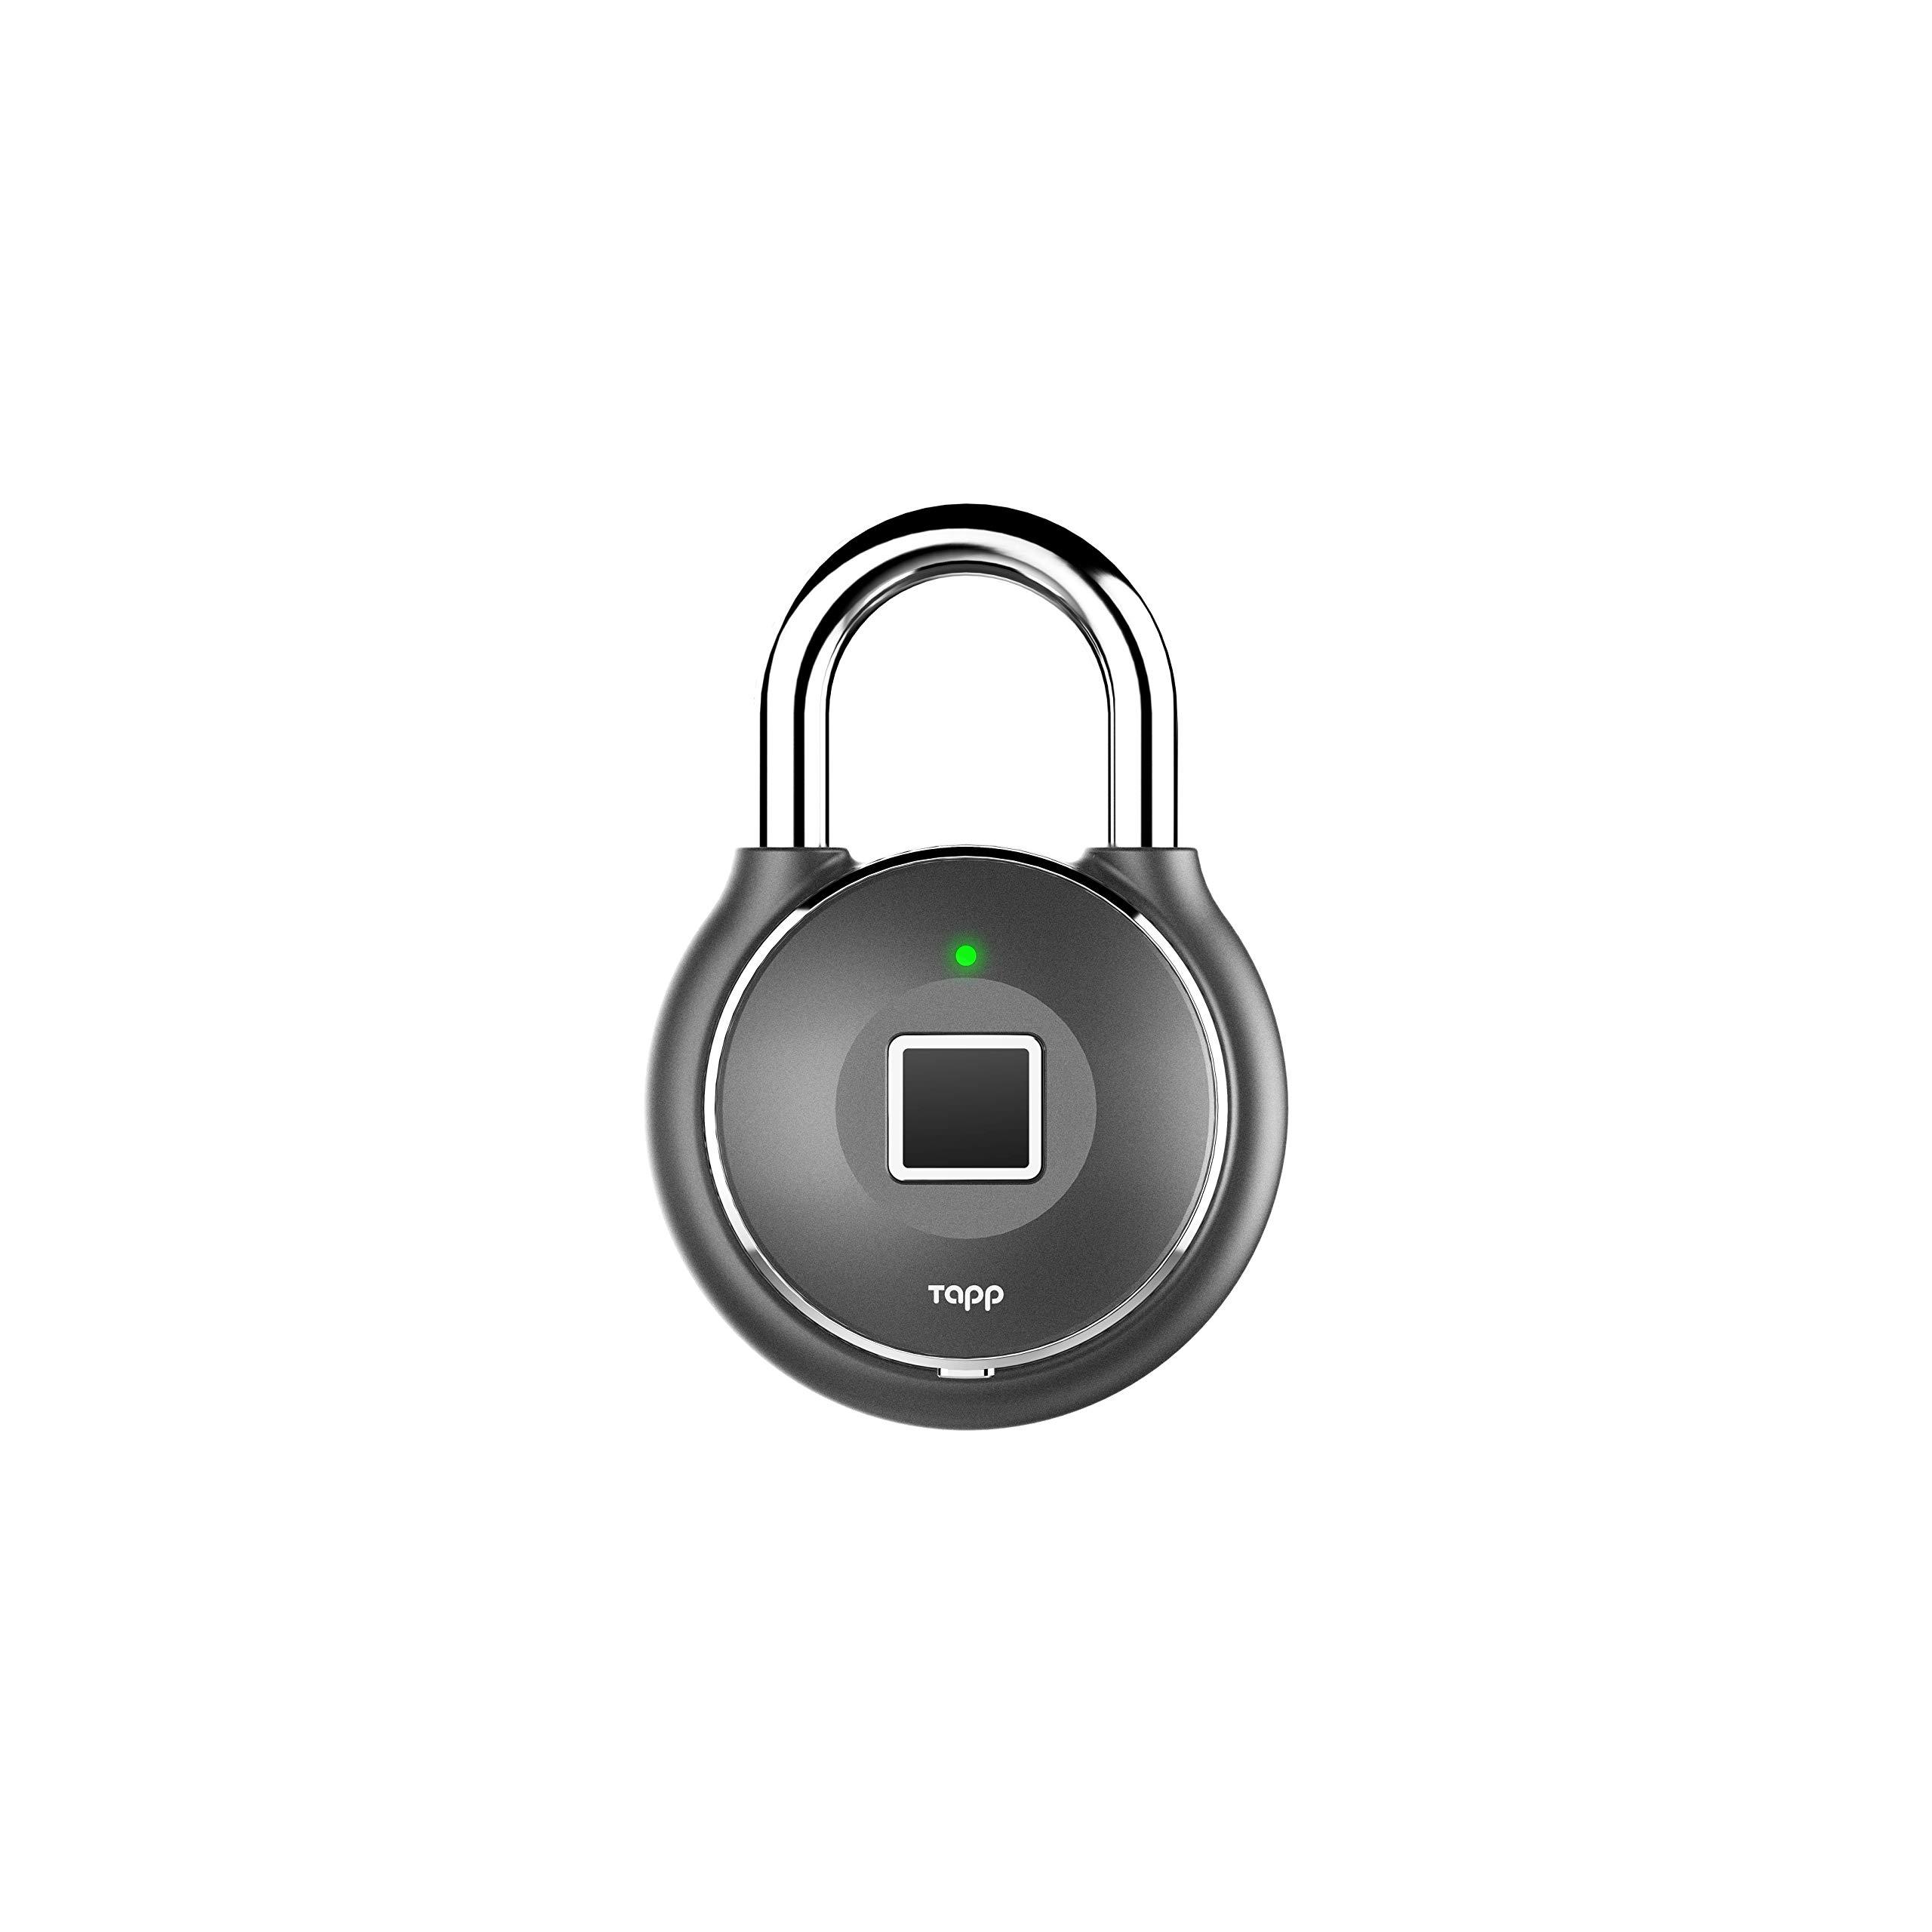 Tapplock one+ Gun Metal Fingerprint Bluetooth Biometric Keyless Smart Padlock by Tapp